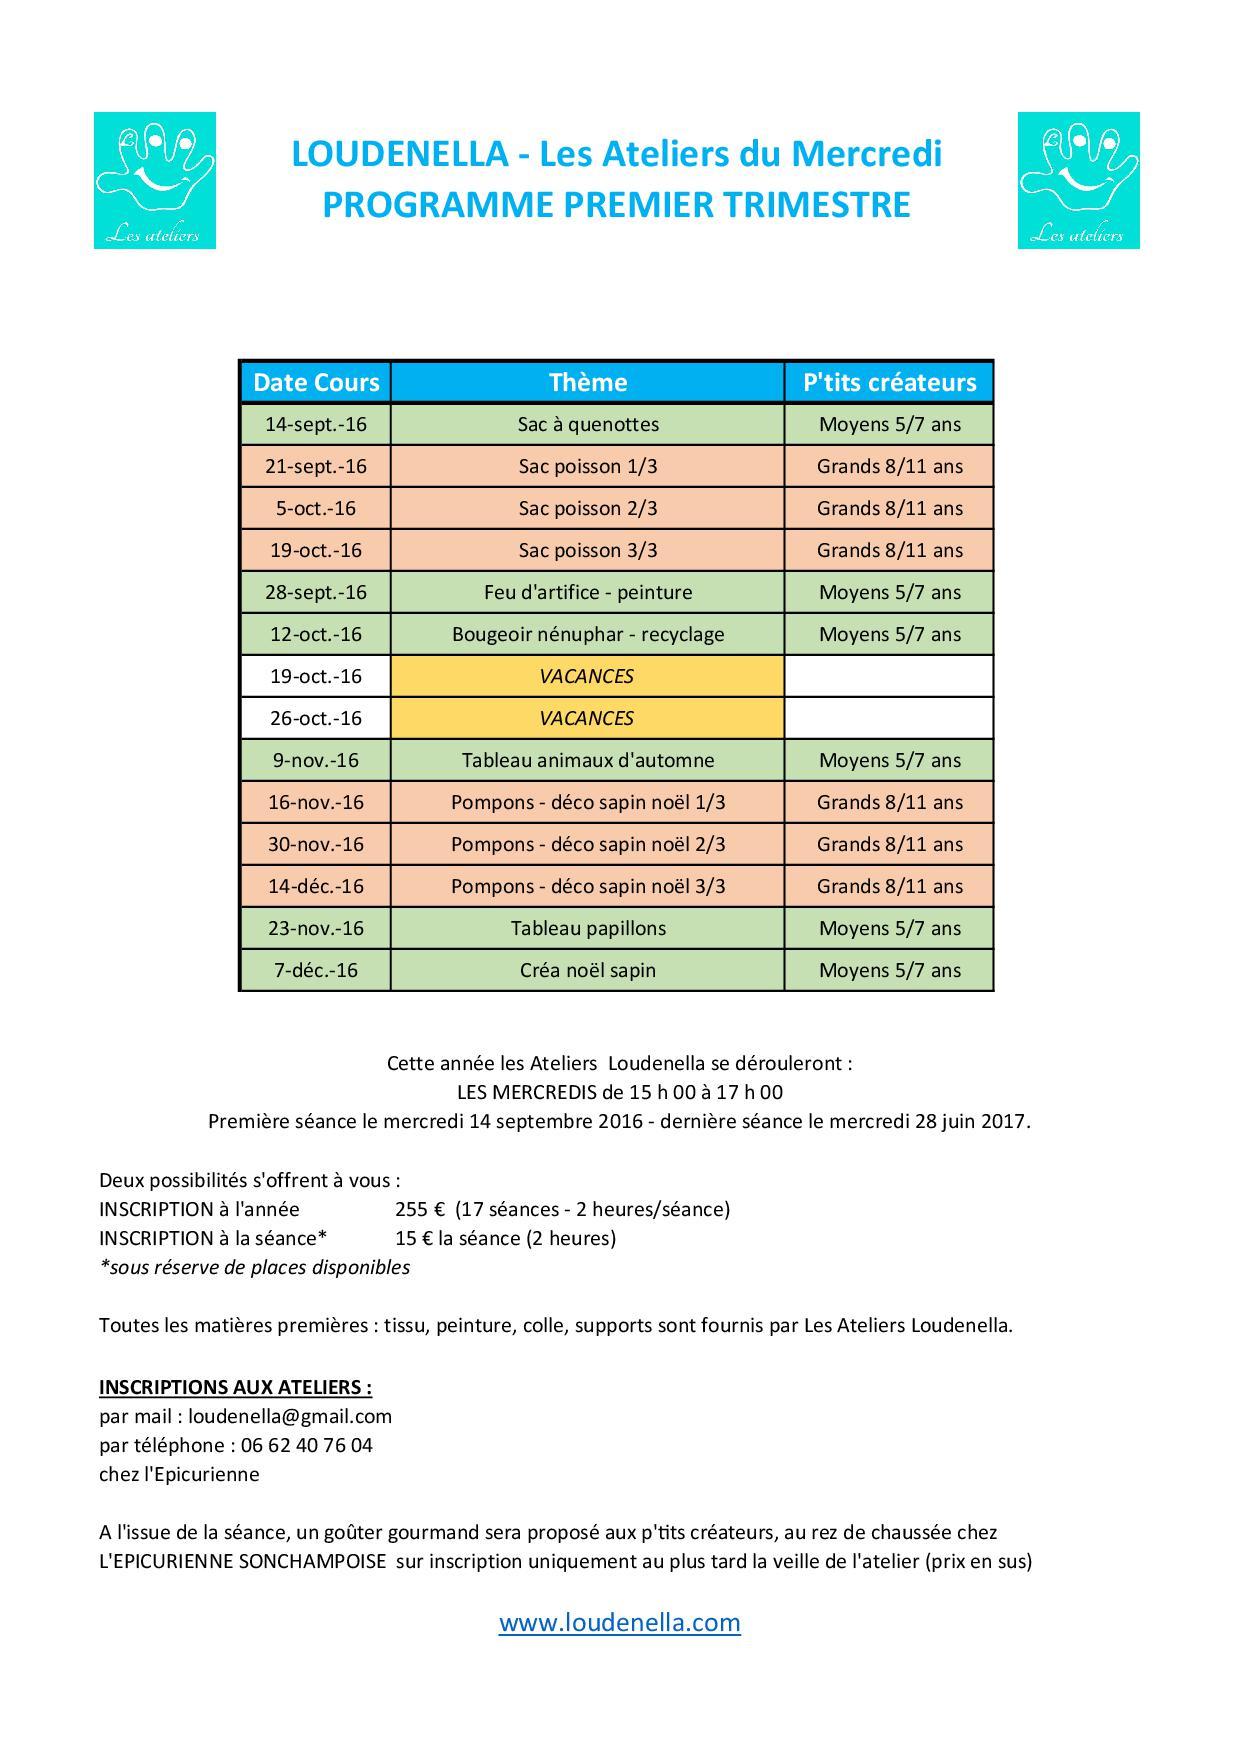 programme-loudenella-ateliers-mercredi-sept-dec-16